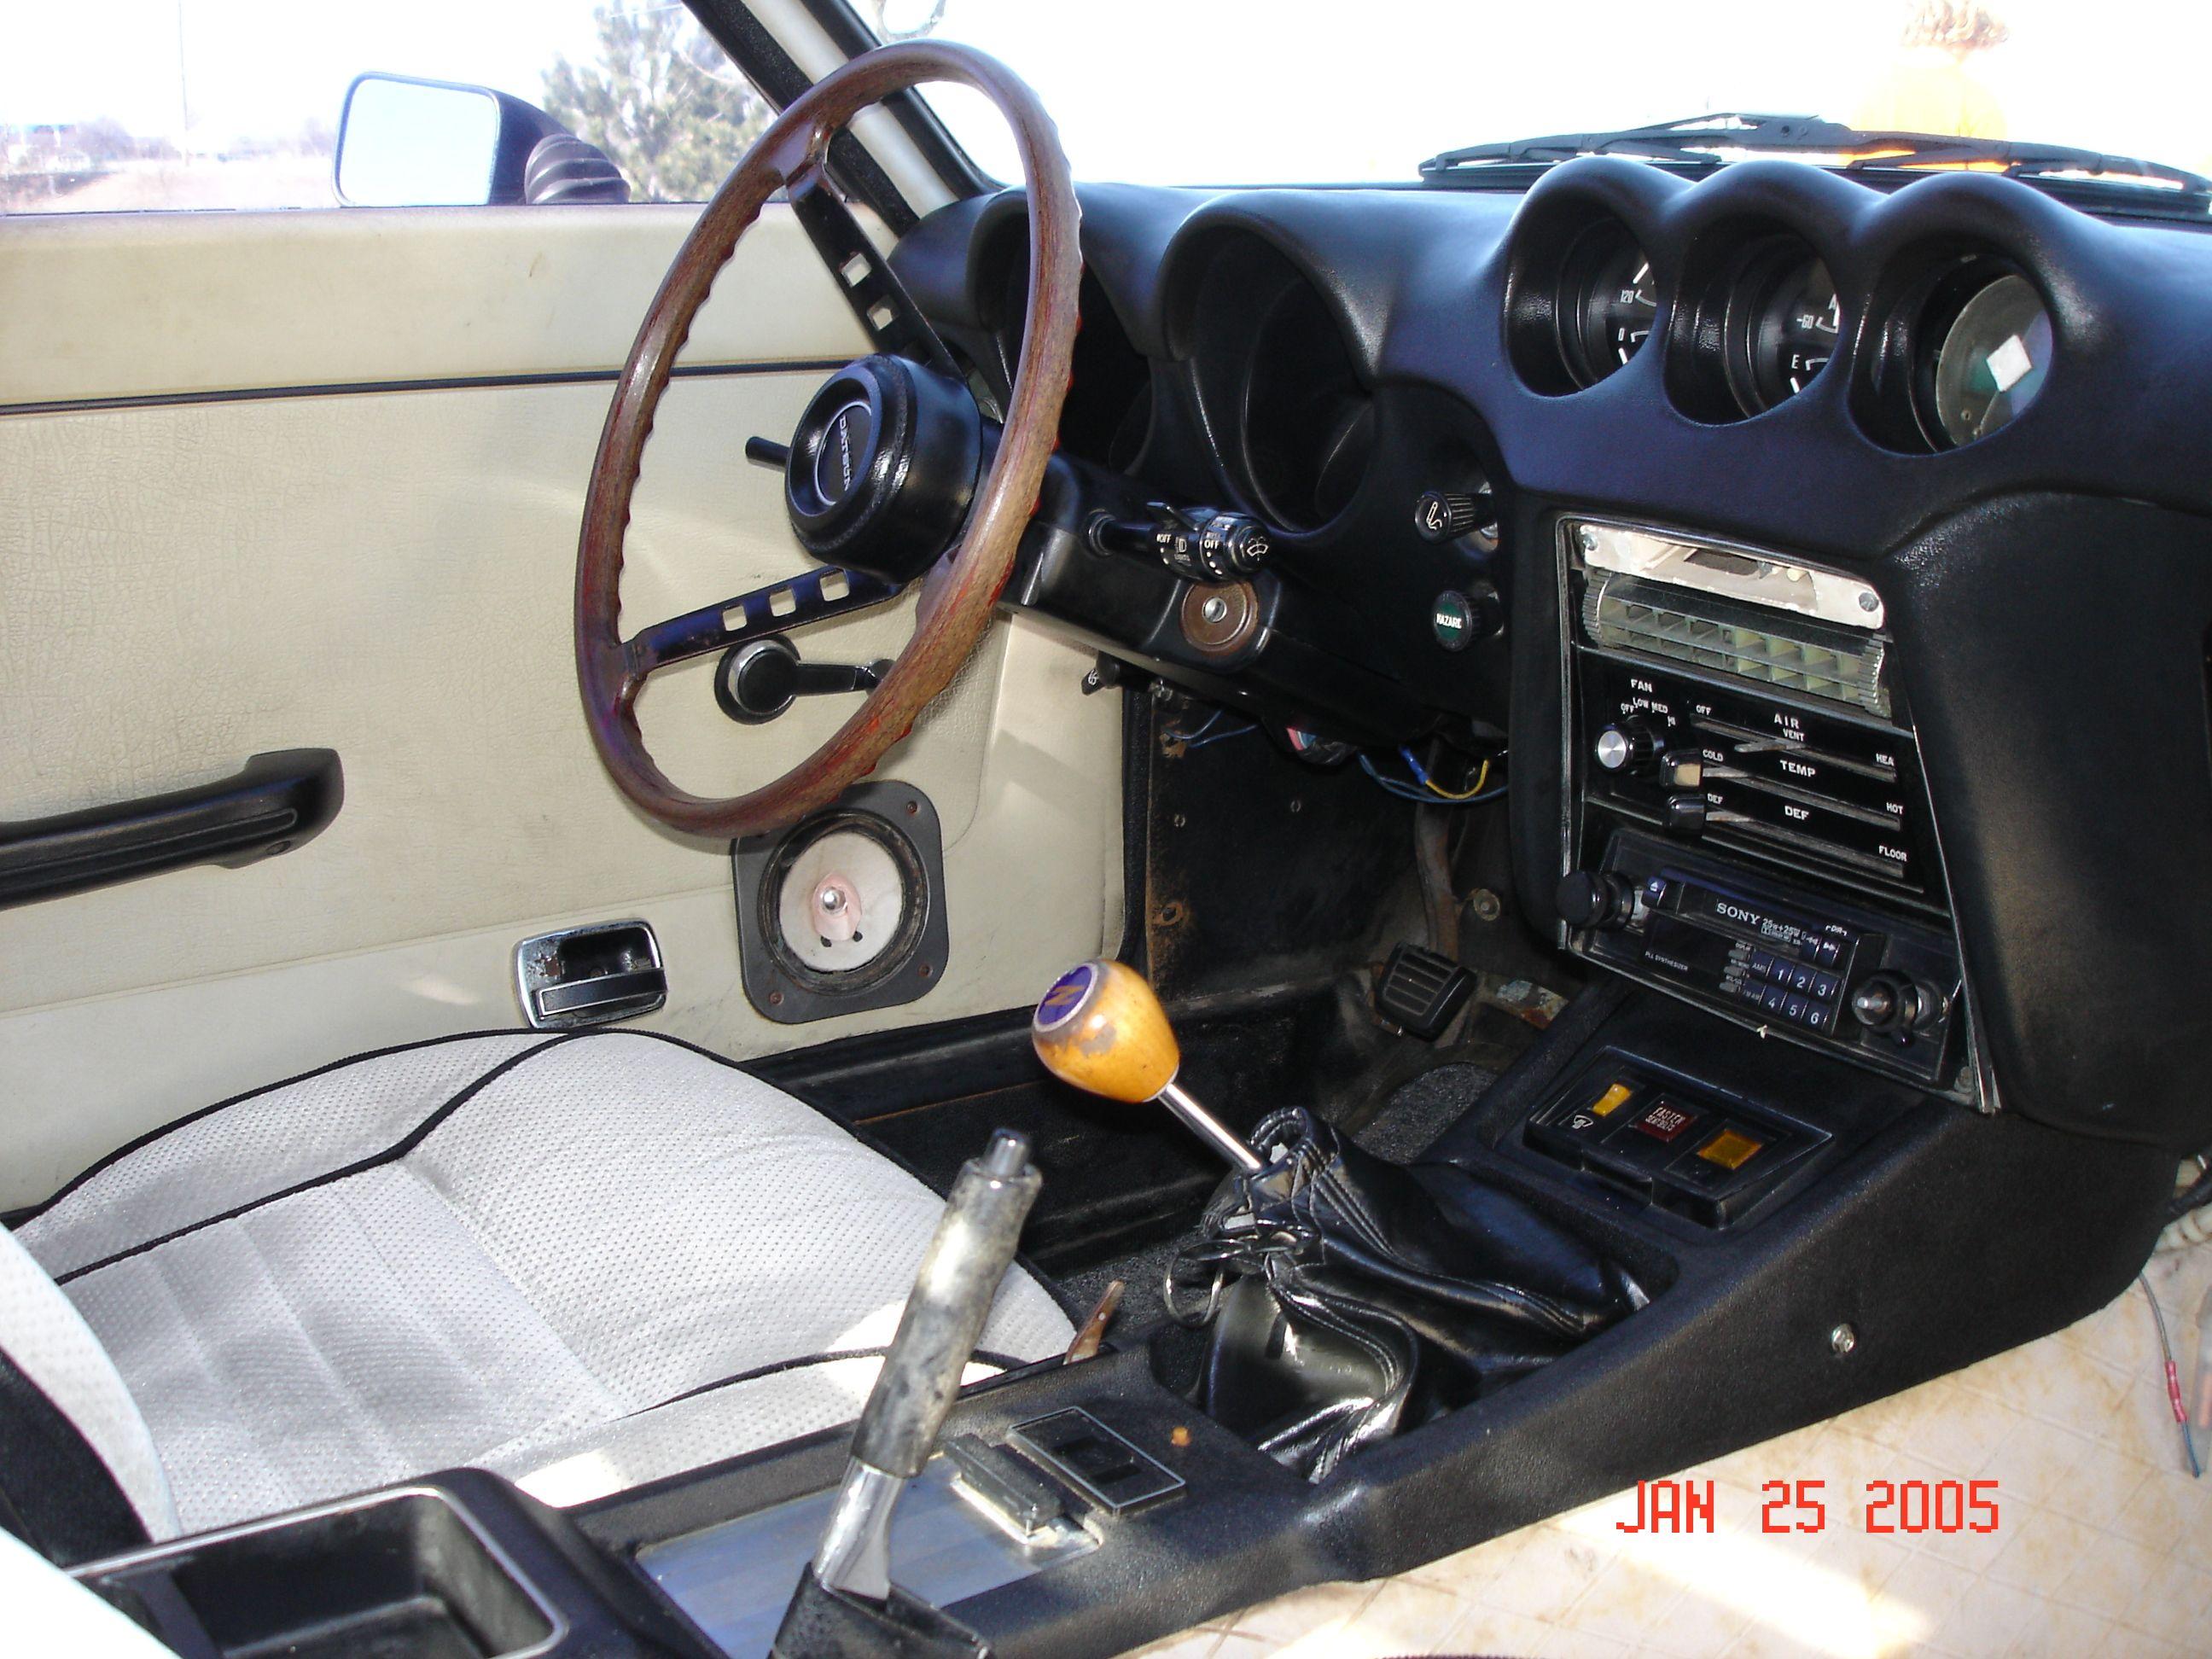 1971 datsun 240z for sale interior adrenaline capsules 1971 datsun 240z for sale interior adrenaline capsules pinterest datsun 240z interiors and cars vanachro Gallery